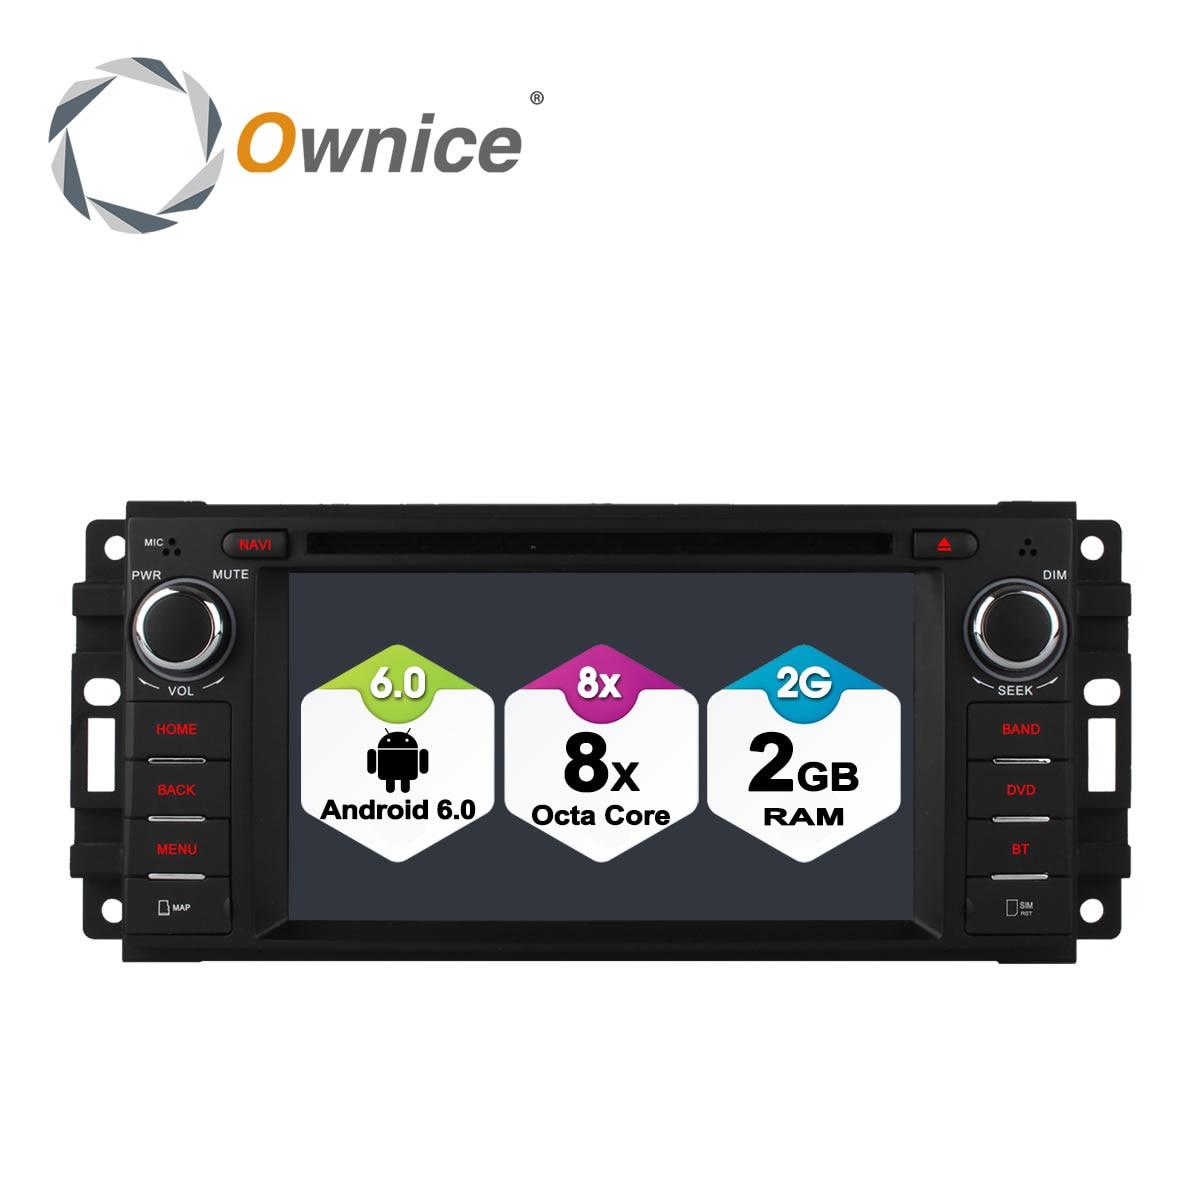 Ownice C500 Android 6,0 Octa 8 Core dvd del coche para Jeep Dodge Chrysler gps navi con radio BT 32G ROM soporte DAB + 4G LTE DVR